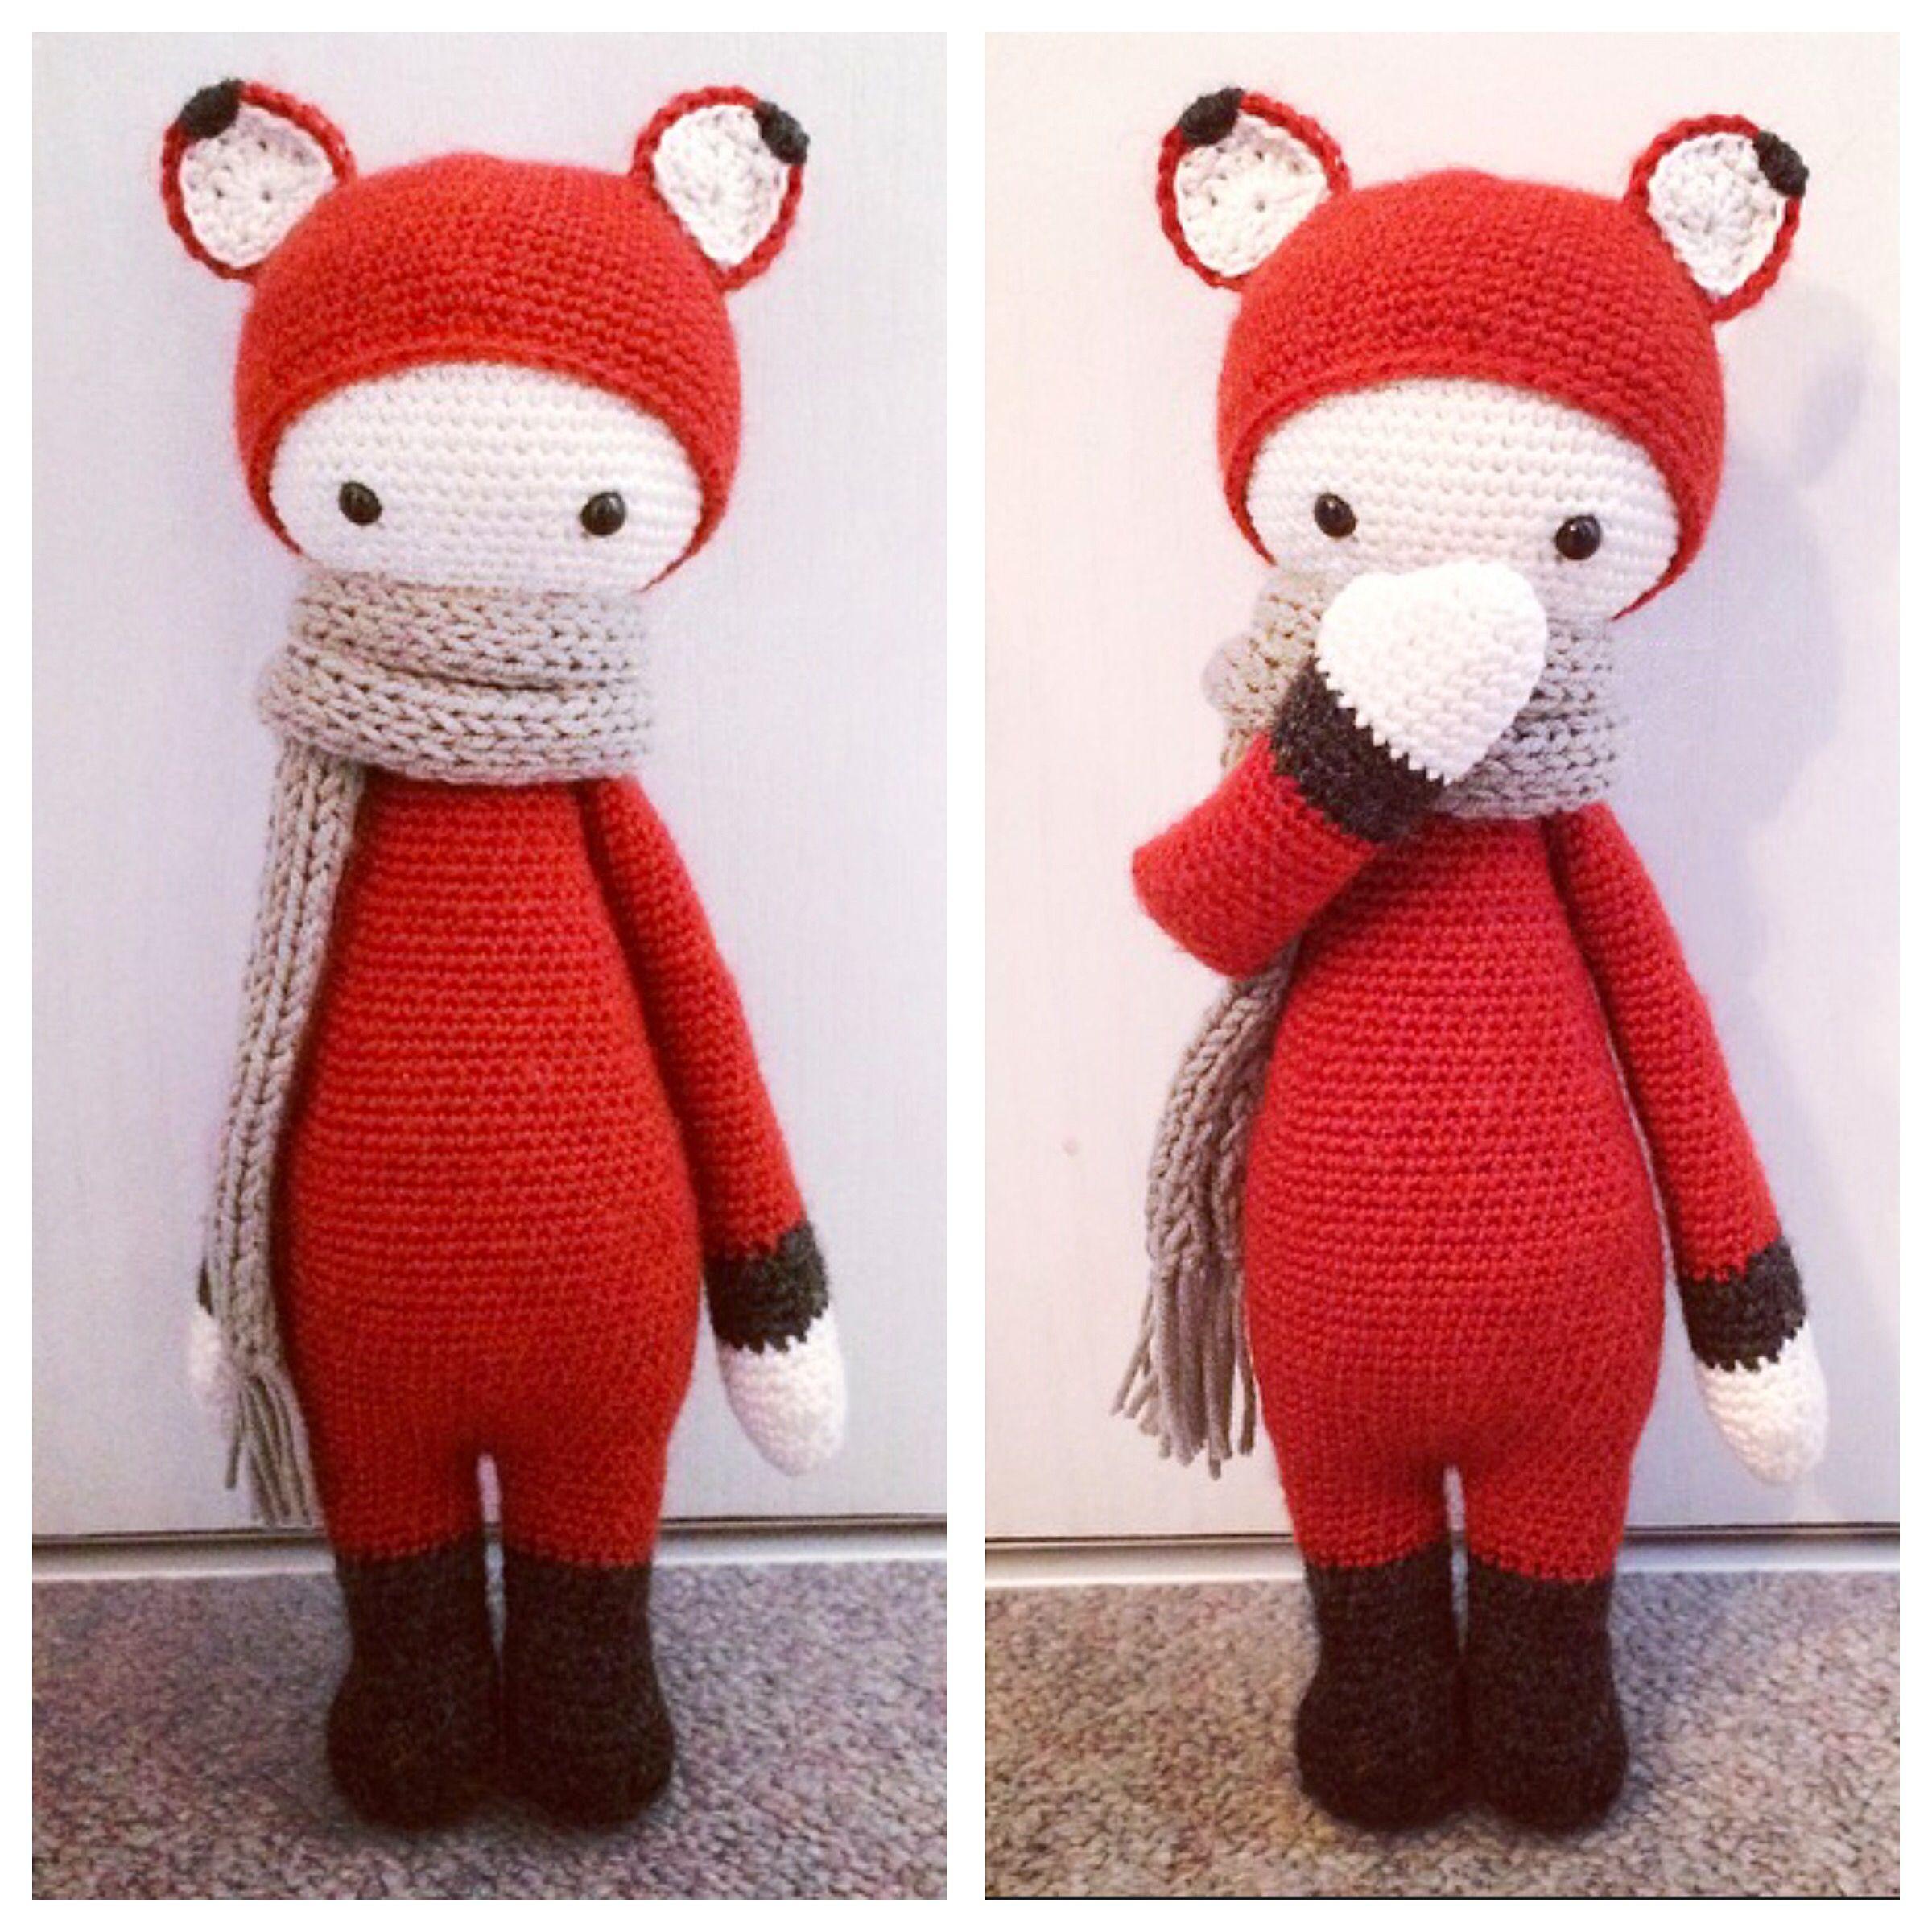 FIBI the fox made by Mareike D. / crochet pattern  by lalylala